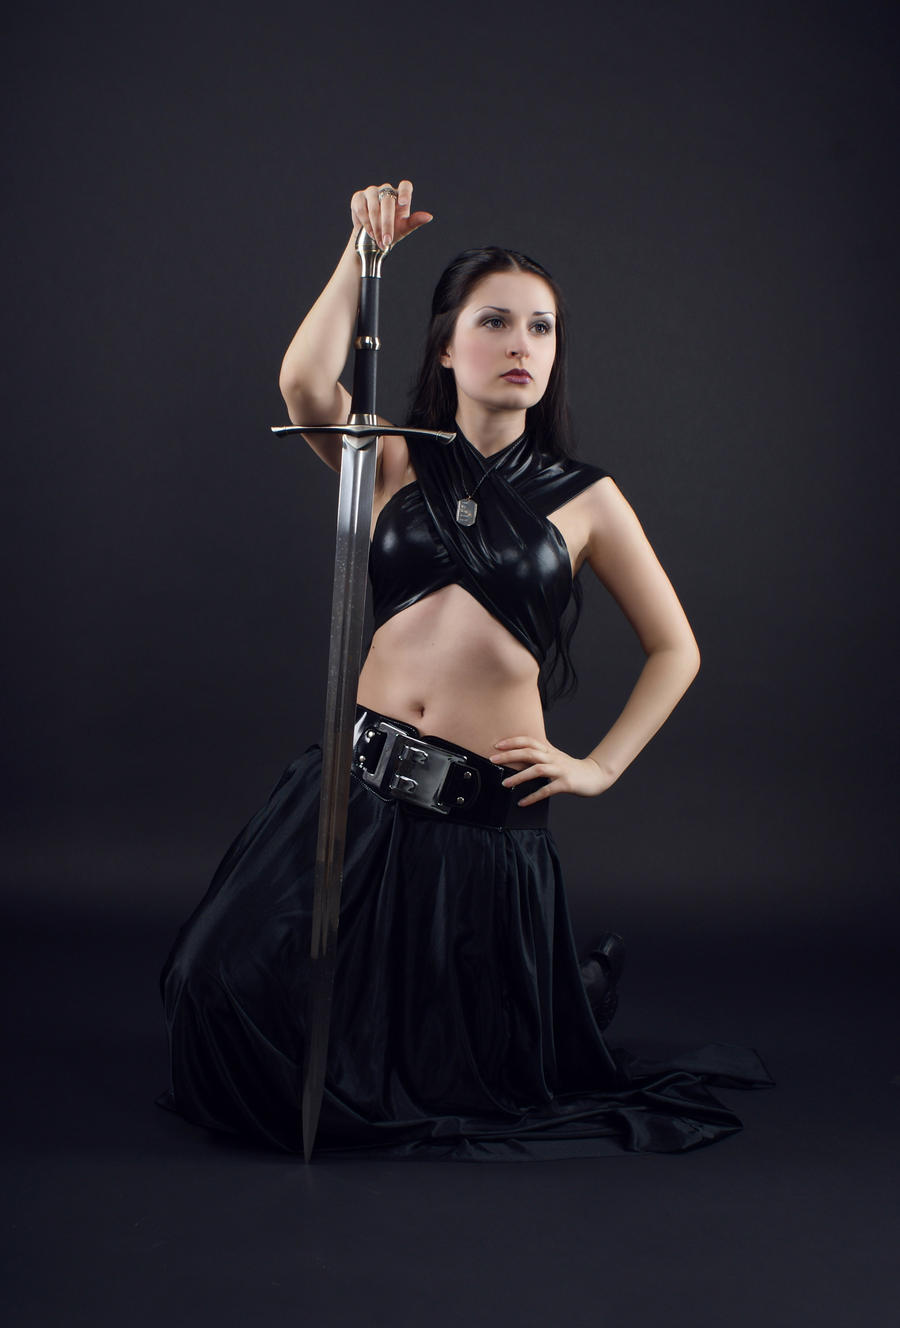 Anett Frozen the Warrior